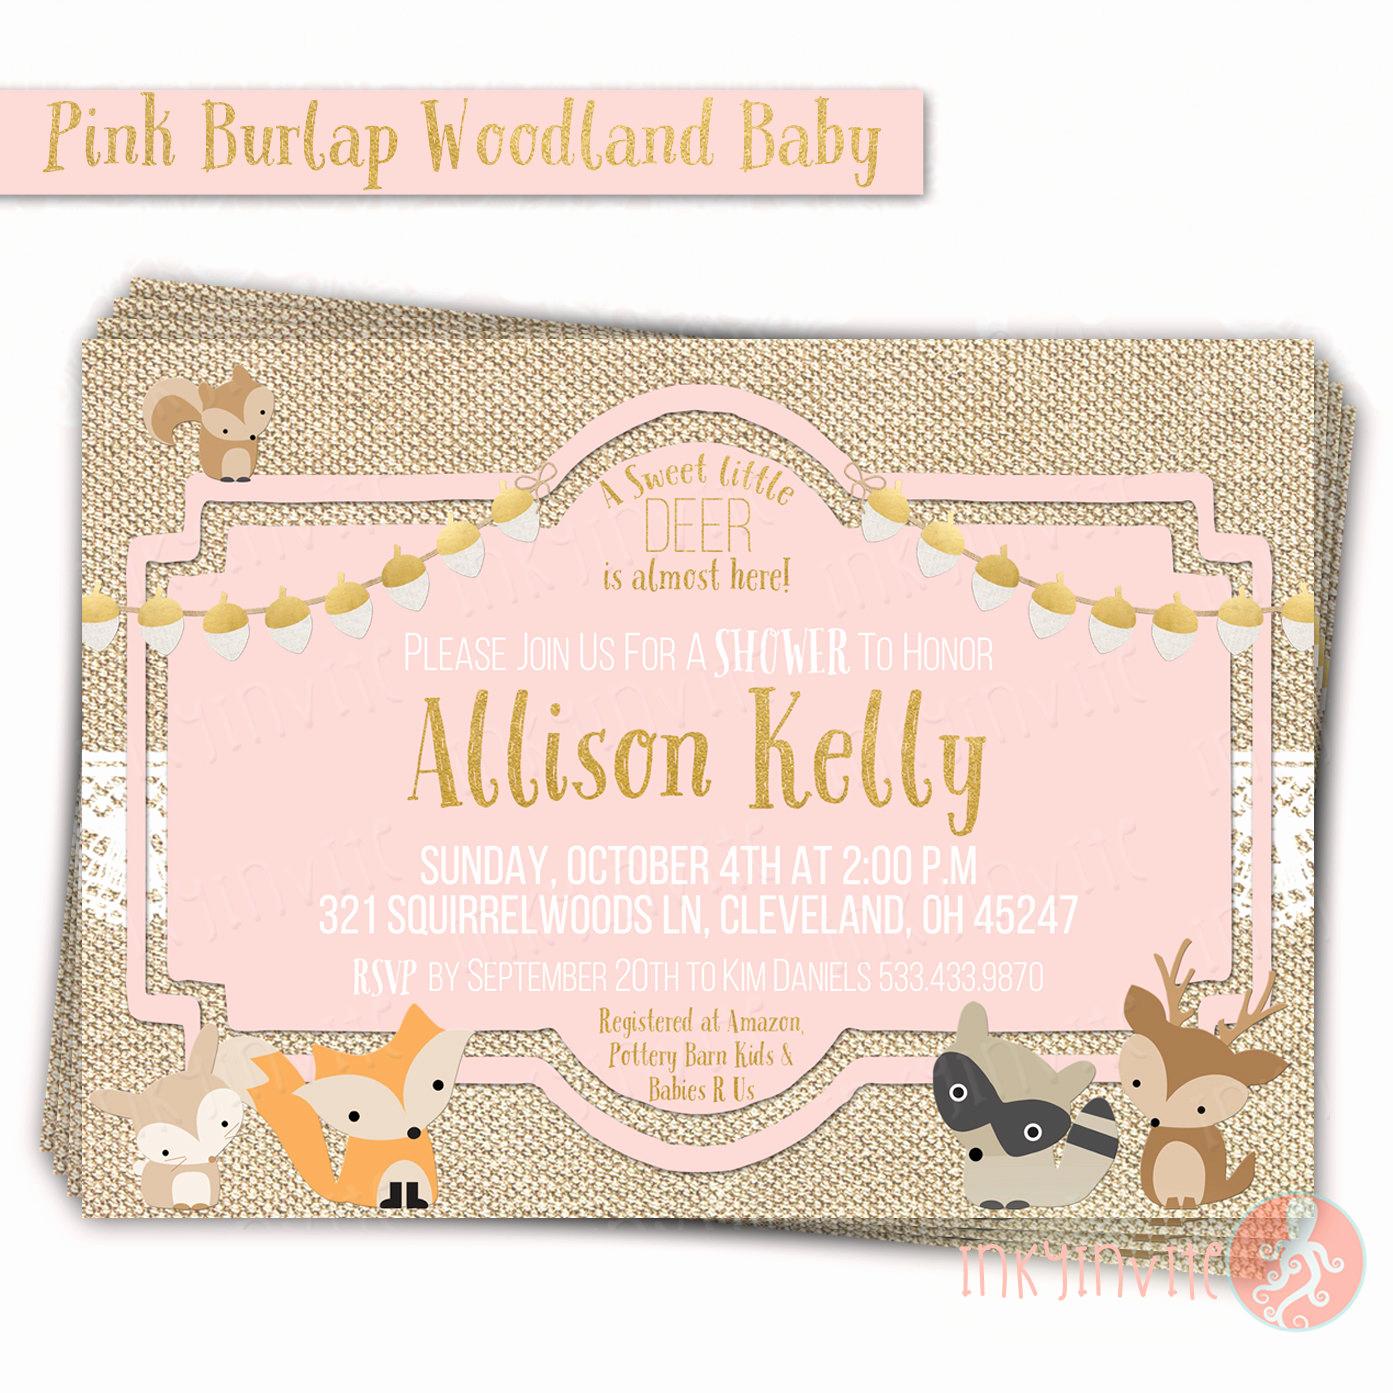 Woodlands Baby Shower Invitation Beautiful Pink Burlap Woodland Baby Shower Invitation Baby Girl